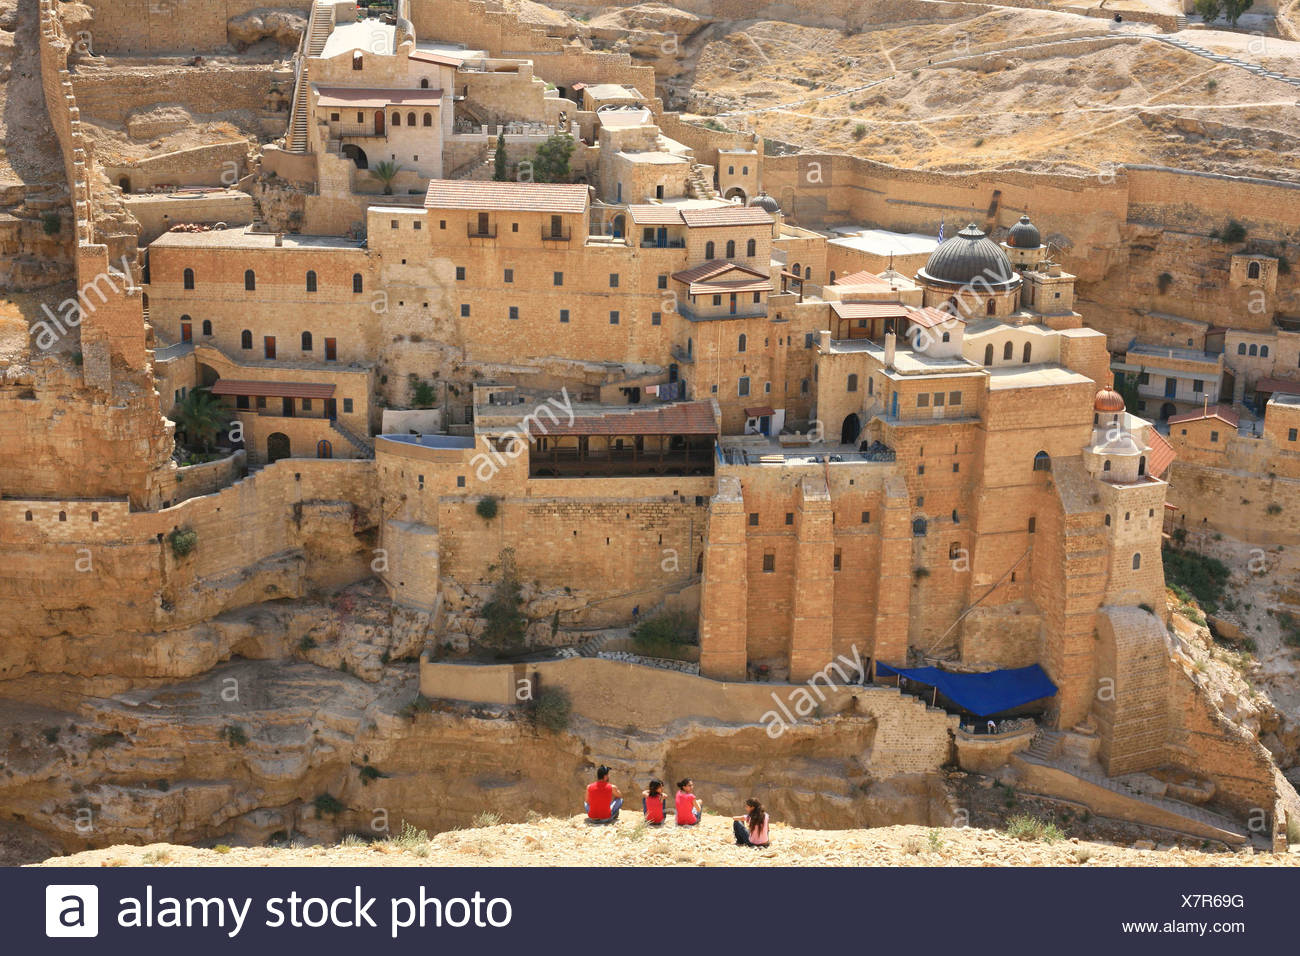 Israel, Judaea Desert, Wadi Kidron, The Great Lavra of St. Sabas (also Mar Saba) Stock Photo